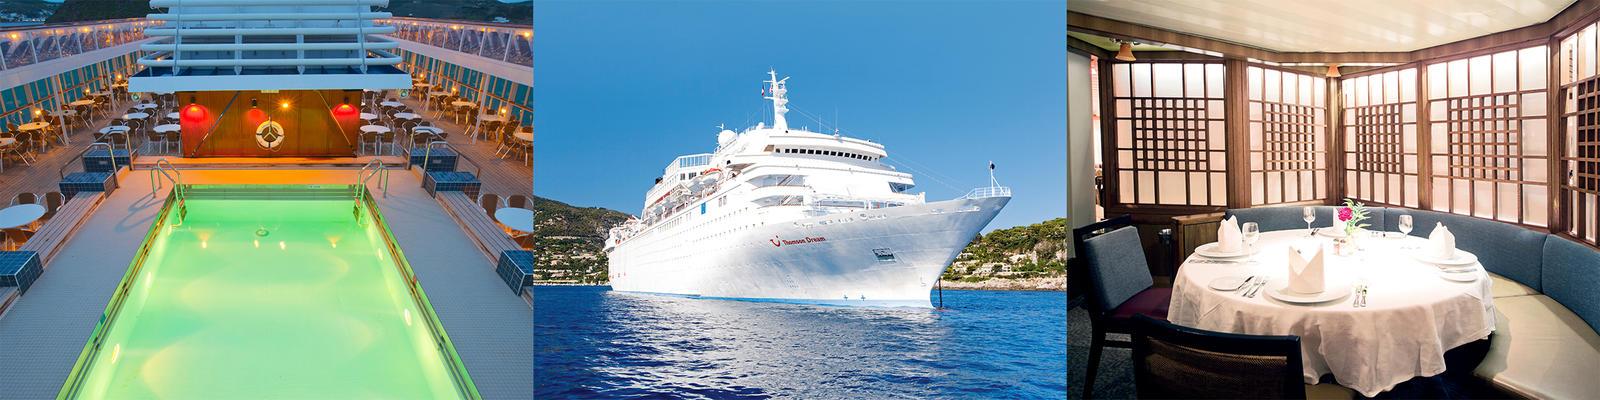 Best Marella Cruises Cruises Reviews And Photos - Thomson dream cruise ship latest news